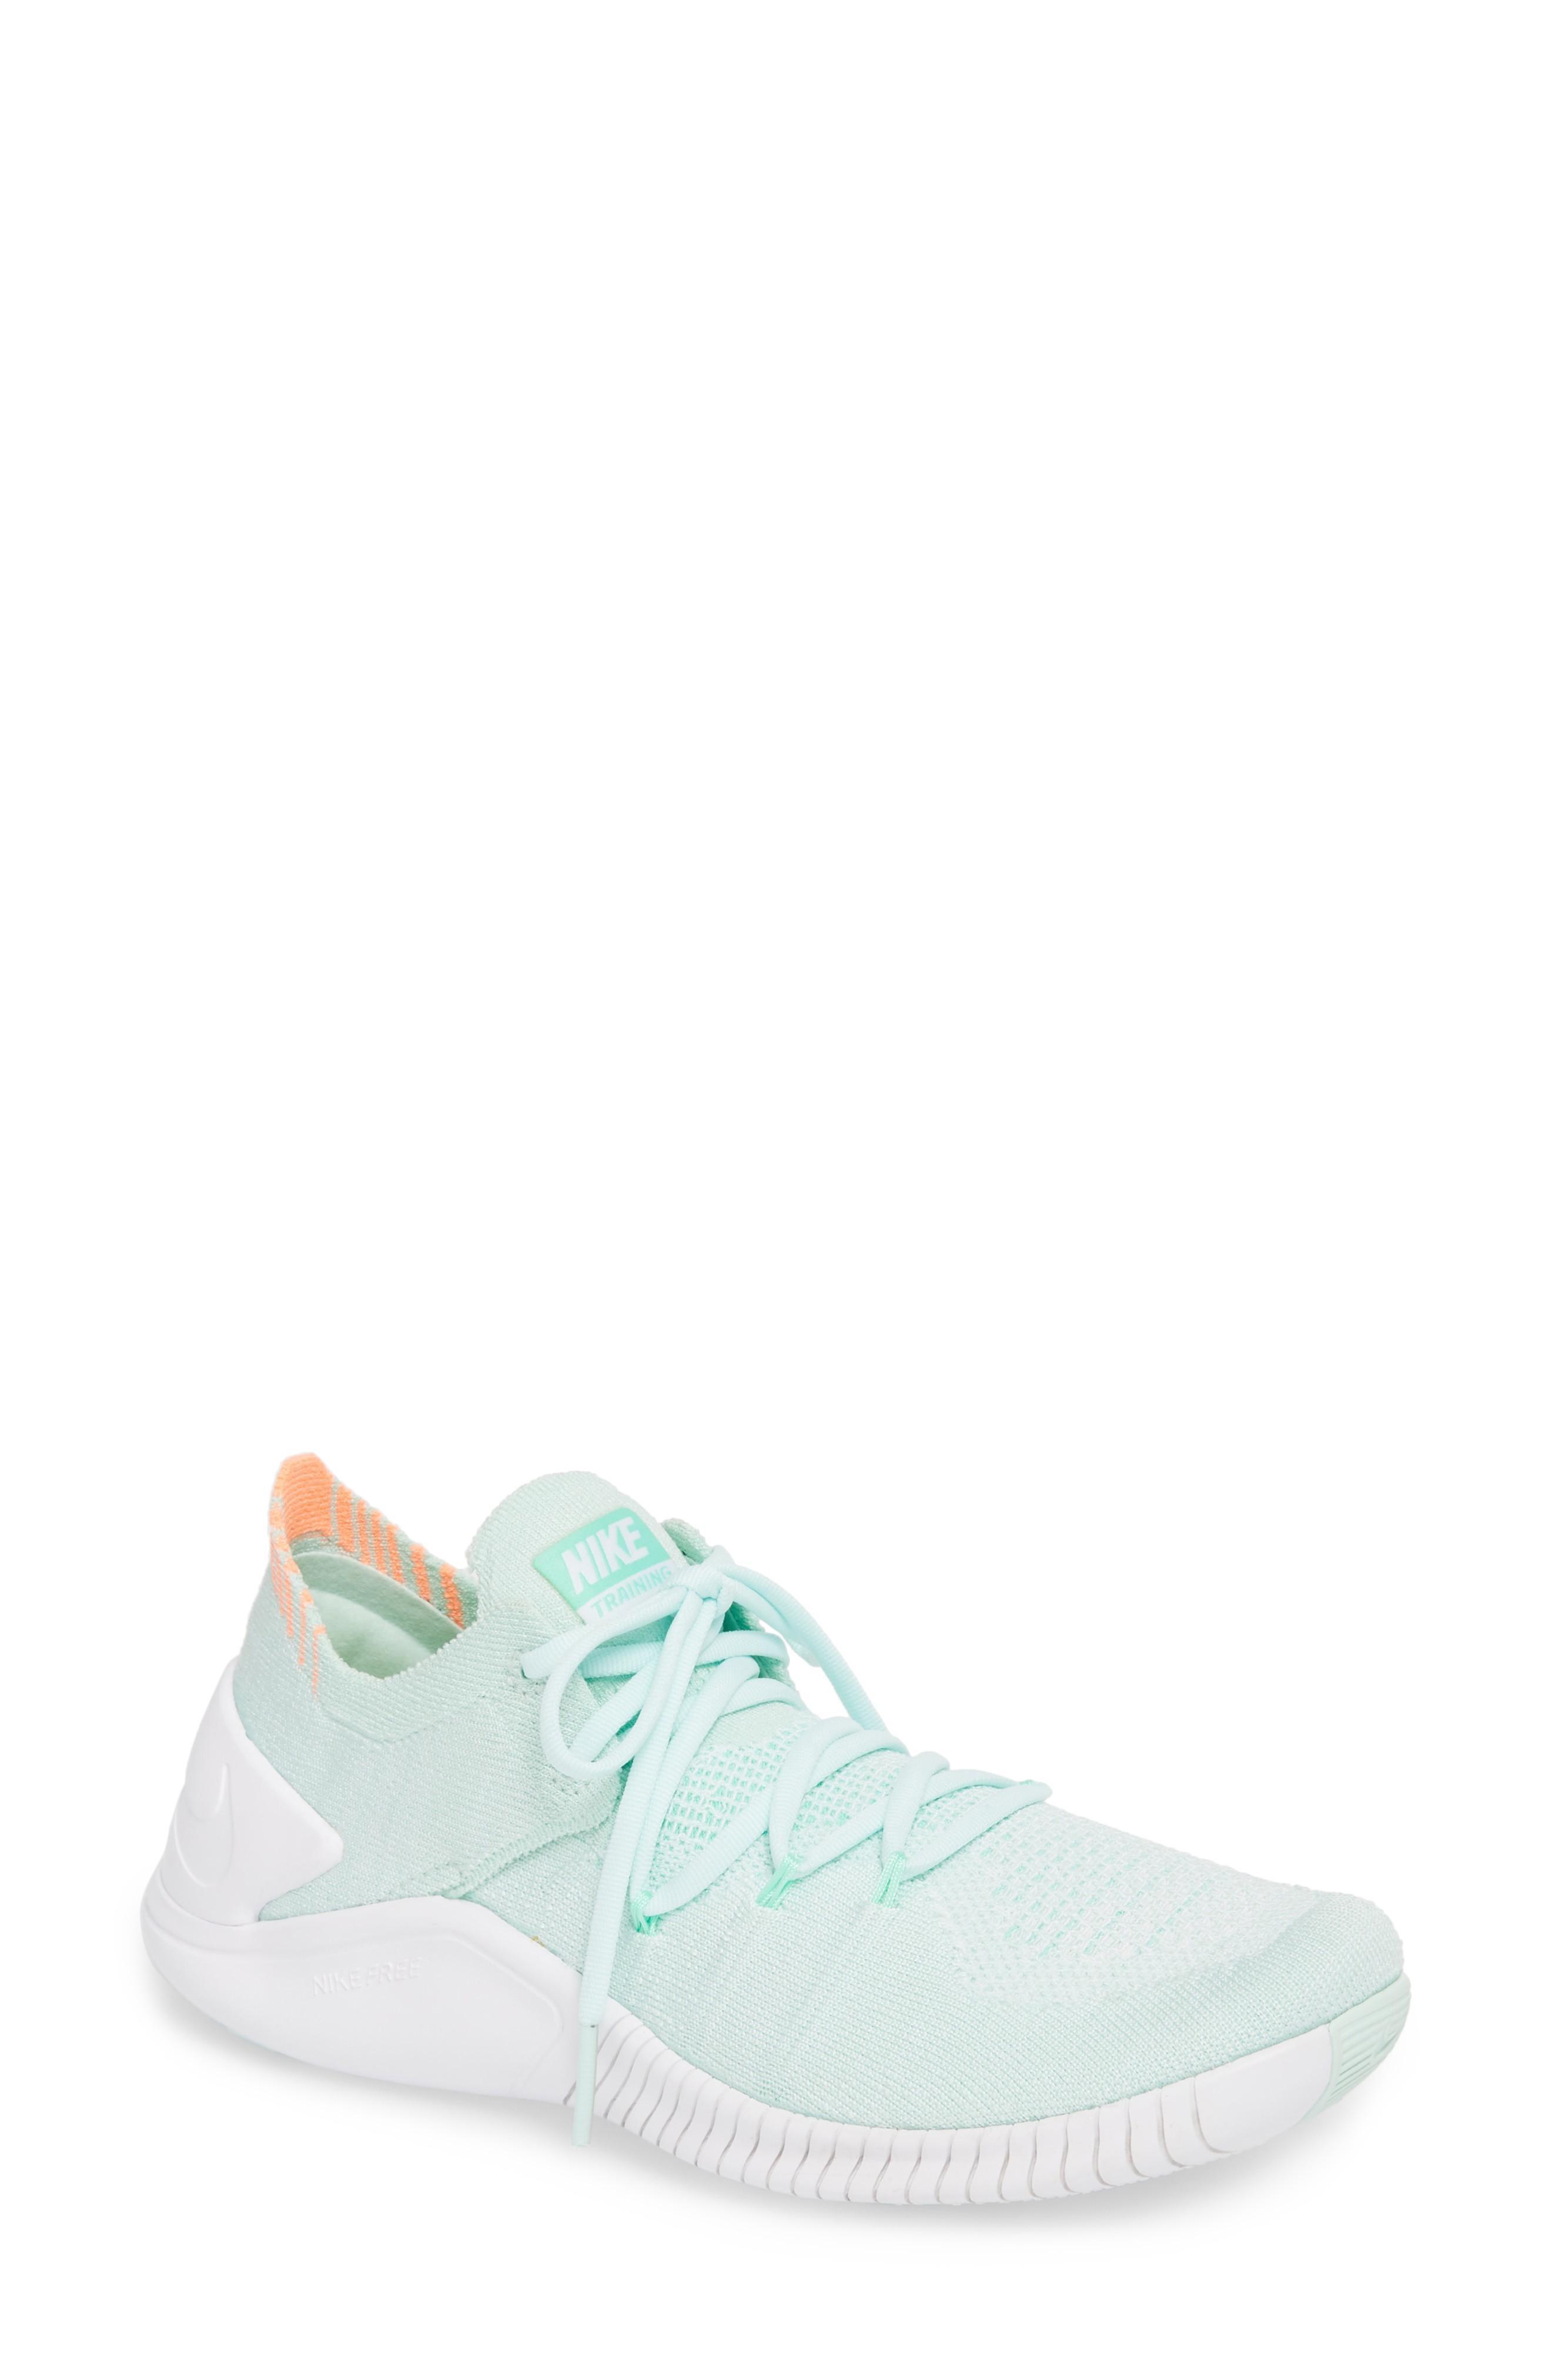 promo code 44ae5 28467 Nike Free Tr Flyknit 3 Training Shoe In Igloo White